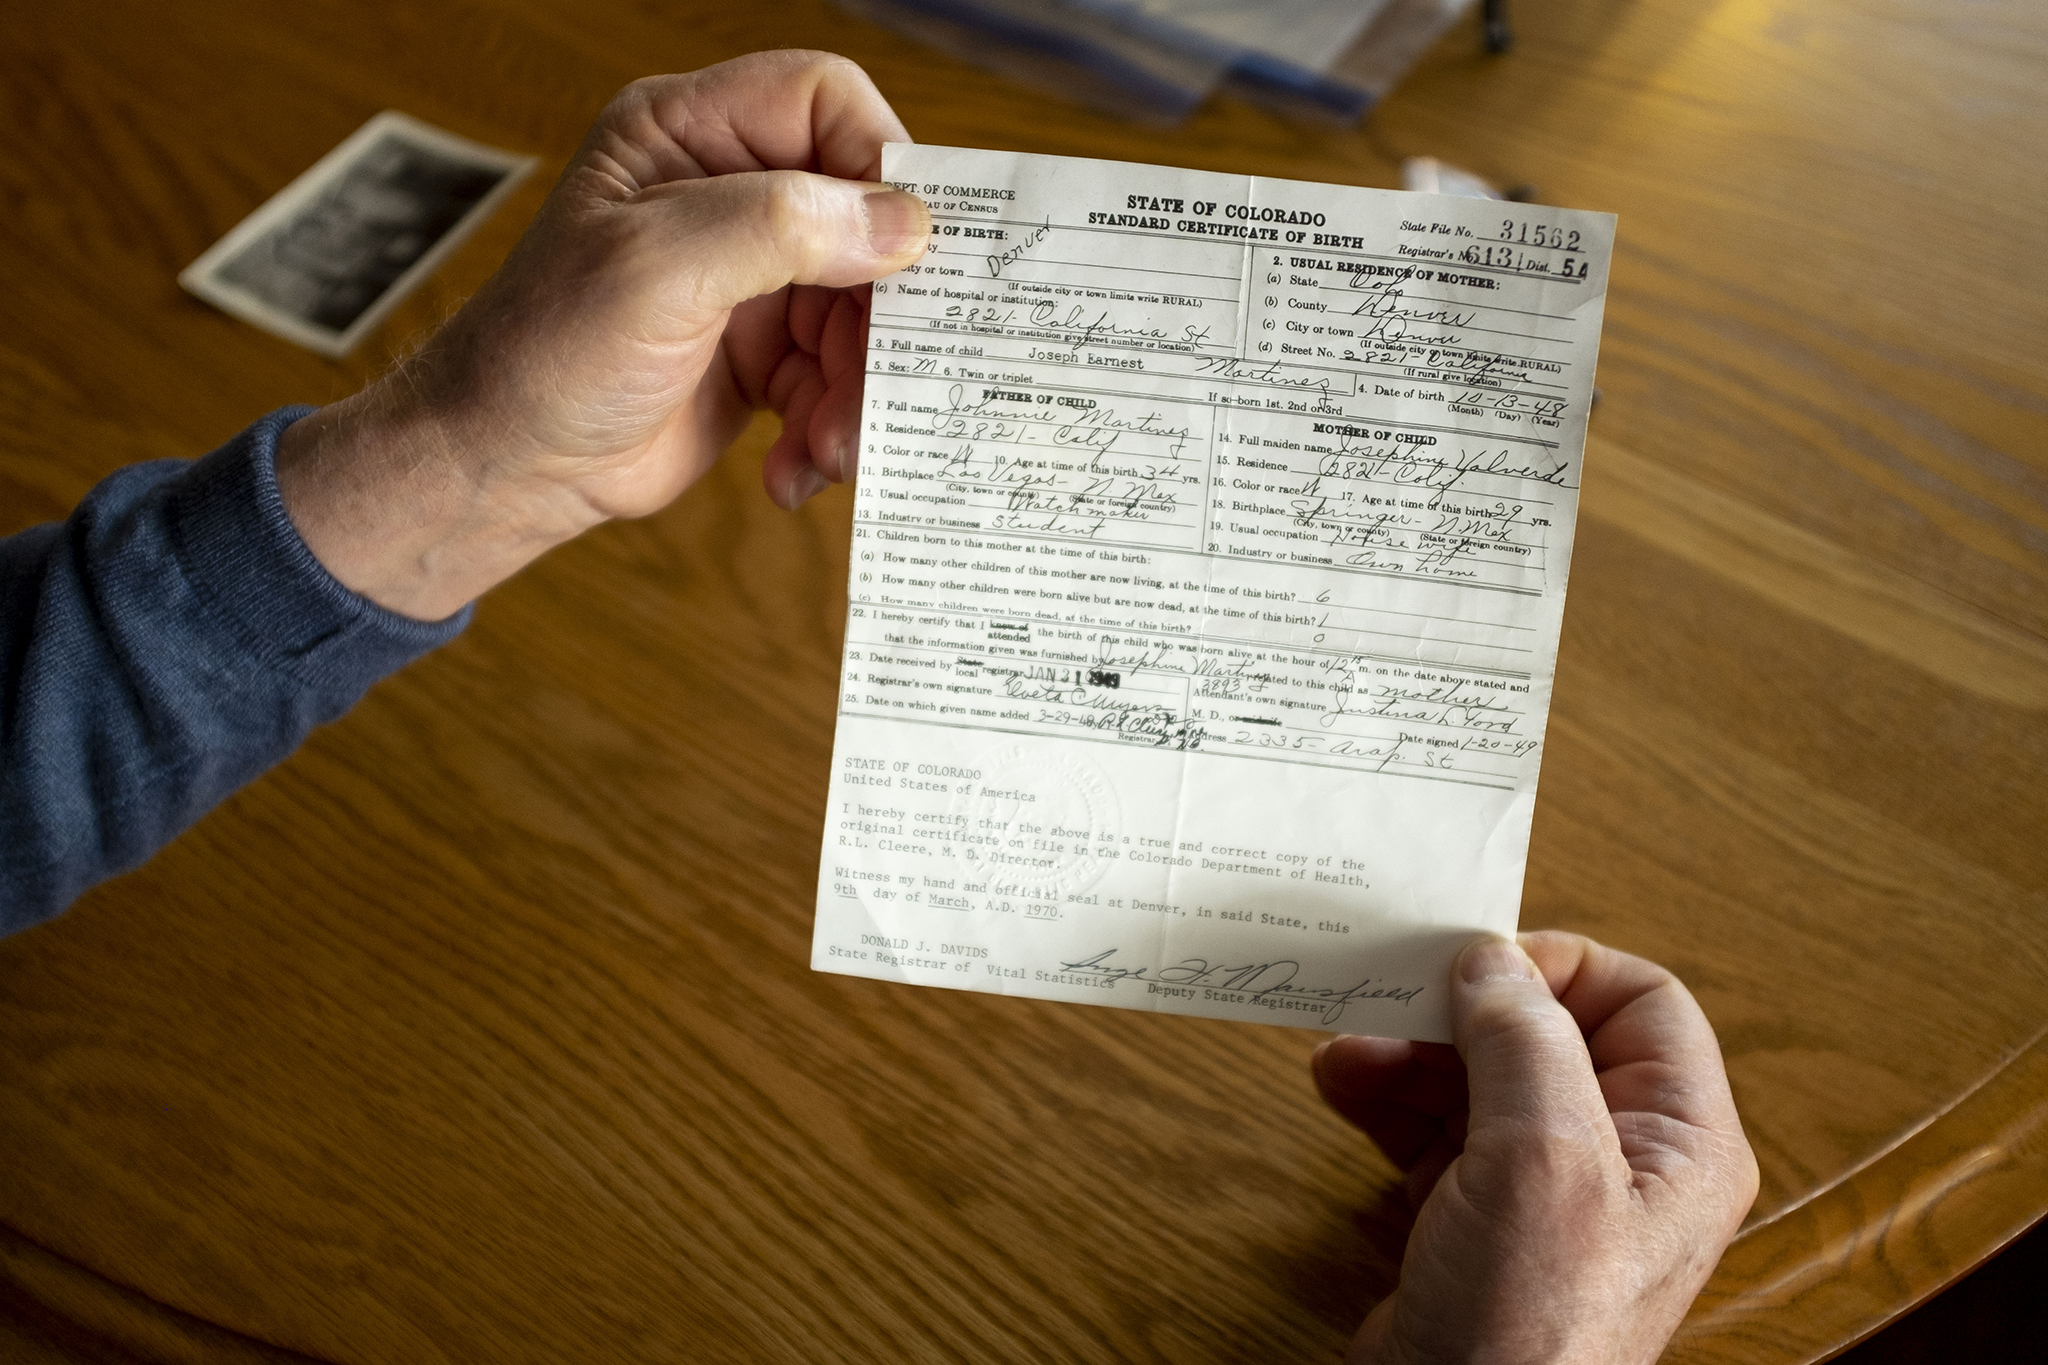 ford justina denverite signed kevin joseph certificate birth feb martinez beaty denver